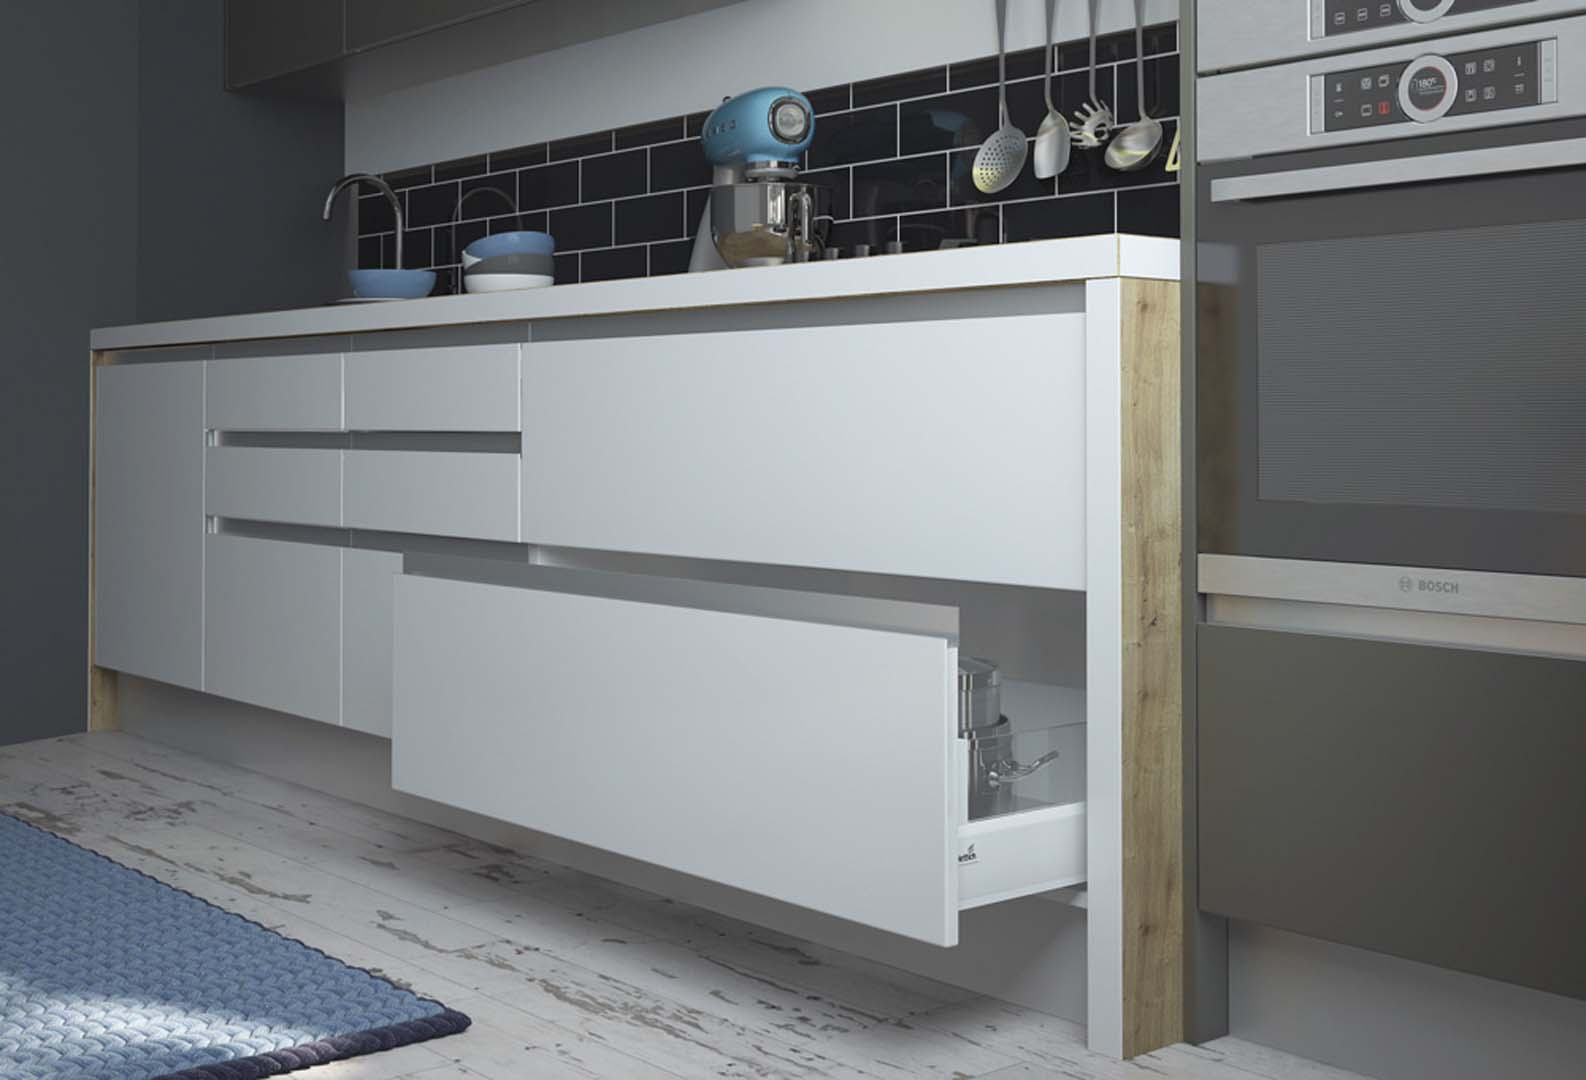 kchenstudio osnabrck amazing schmidt kchen osnabrck with kchenstudio osnabrck excellent. Black Bedroom Furniture Sets. Home Design Ideas